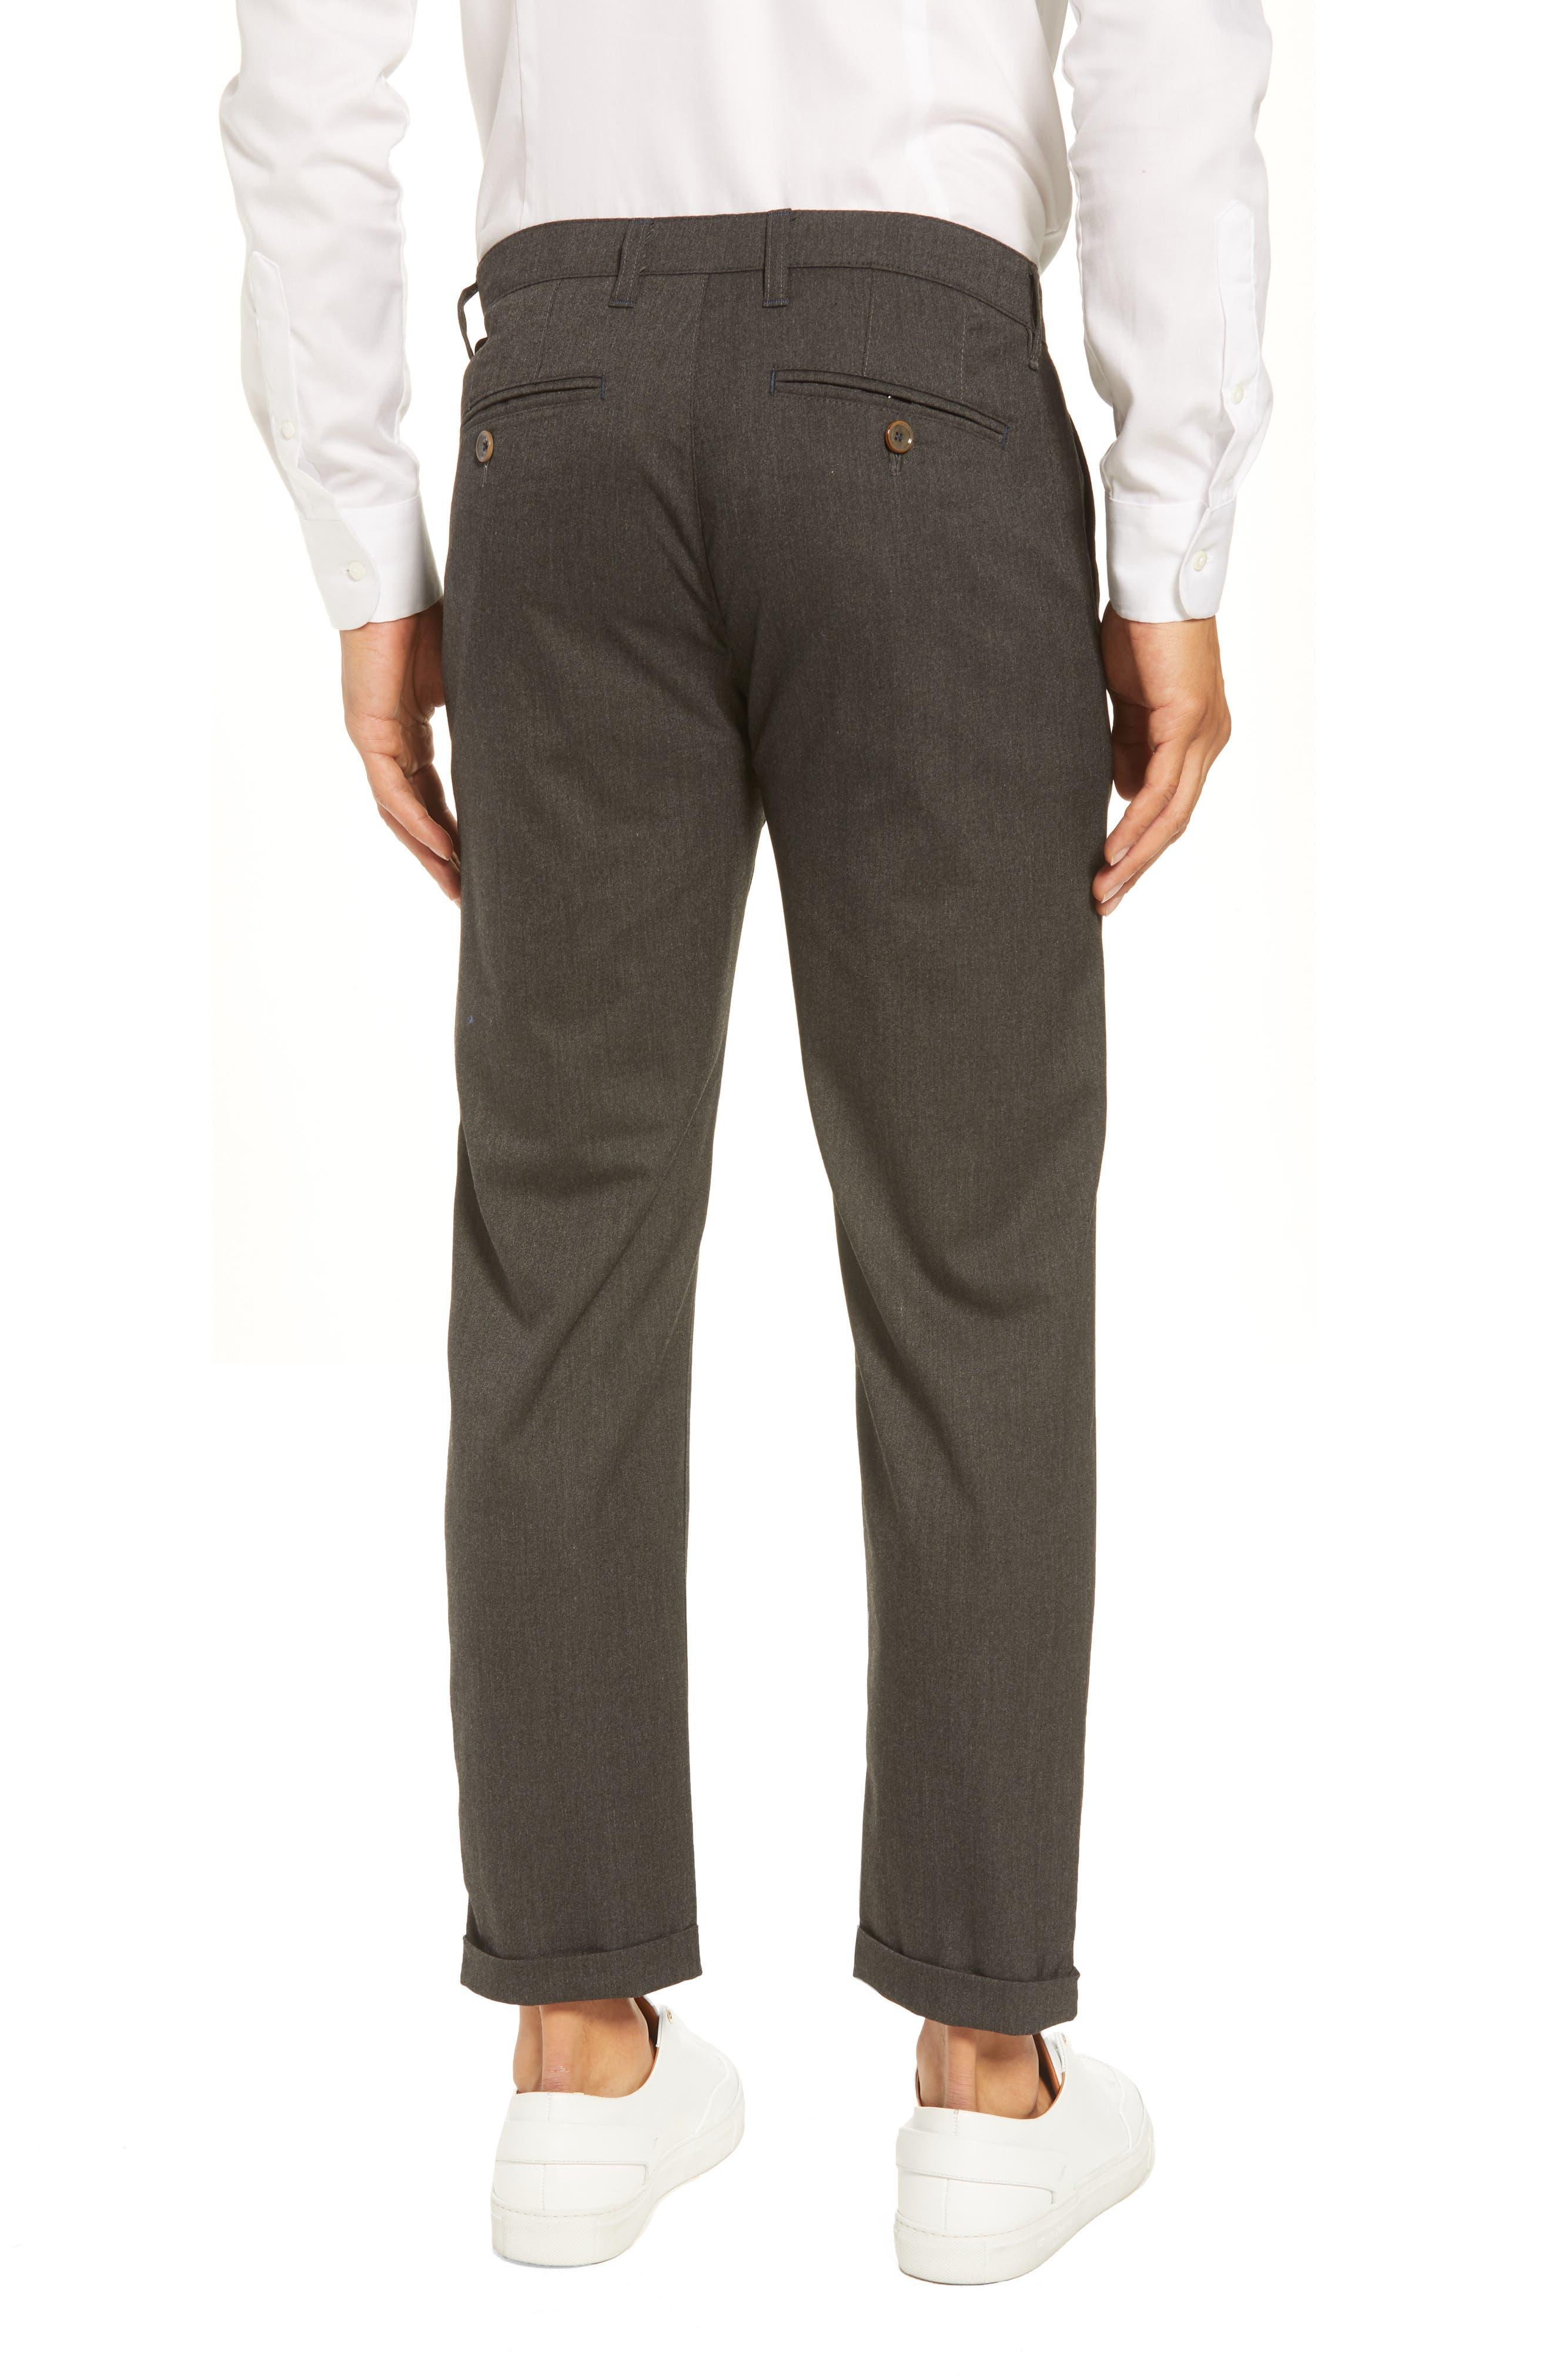 Champi Pleated Cropped Pants,                             Alternate thumbnail 2, color,                             Black